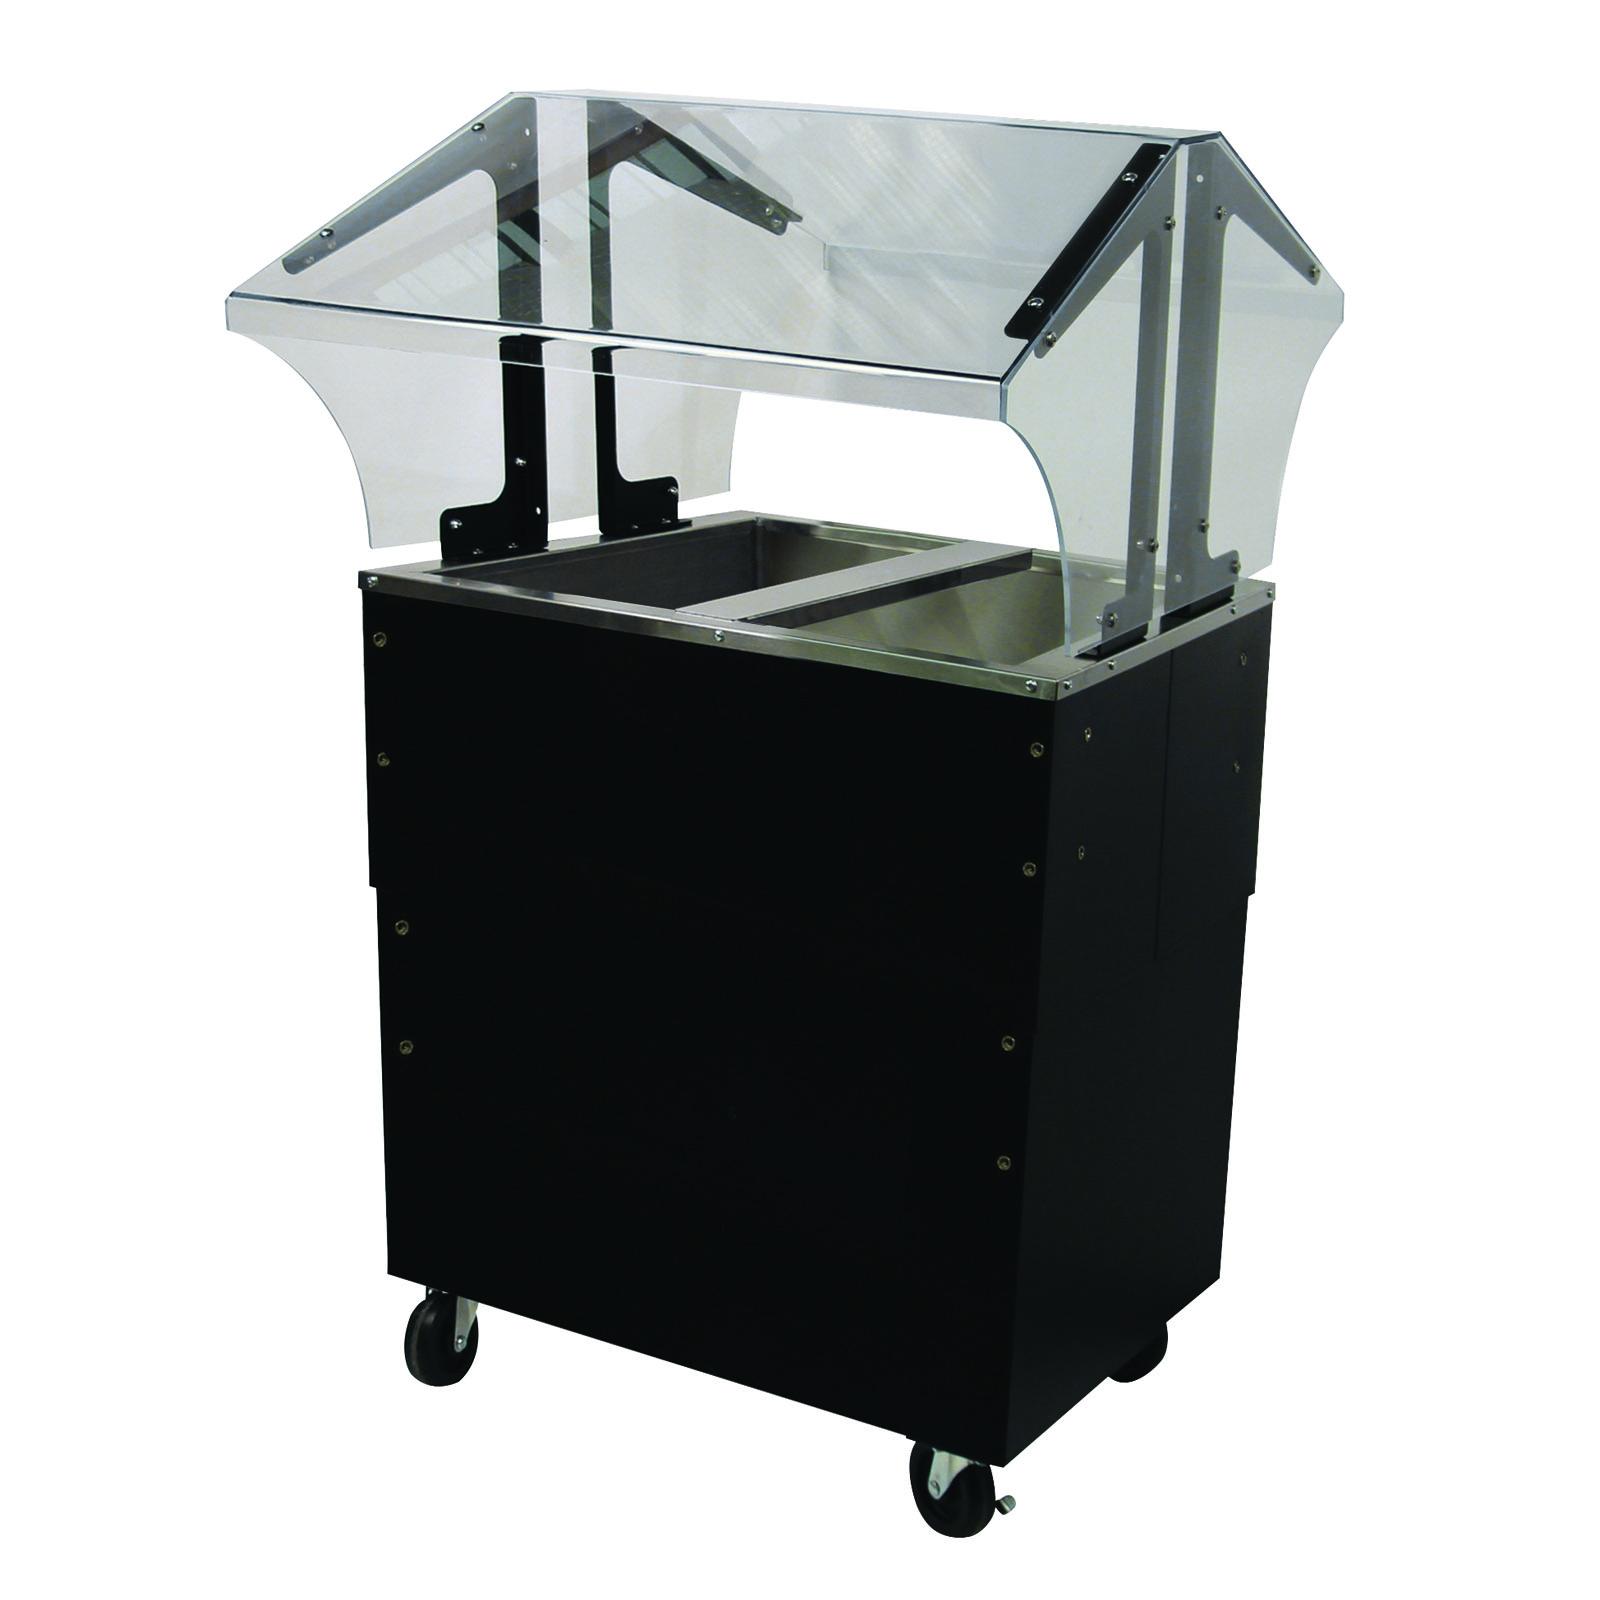 Advance Tabco B2-CPU-B-SB serving counter, cold food